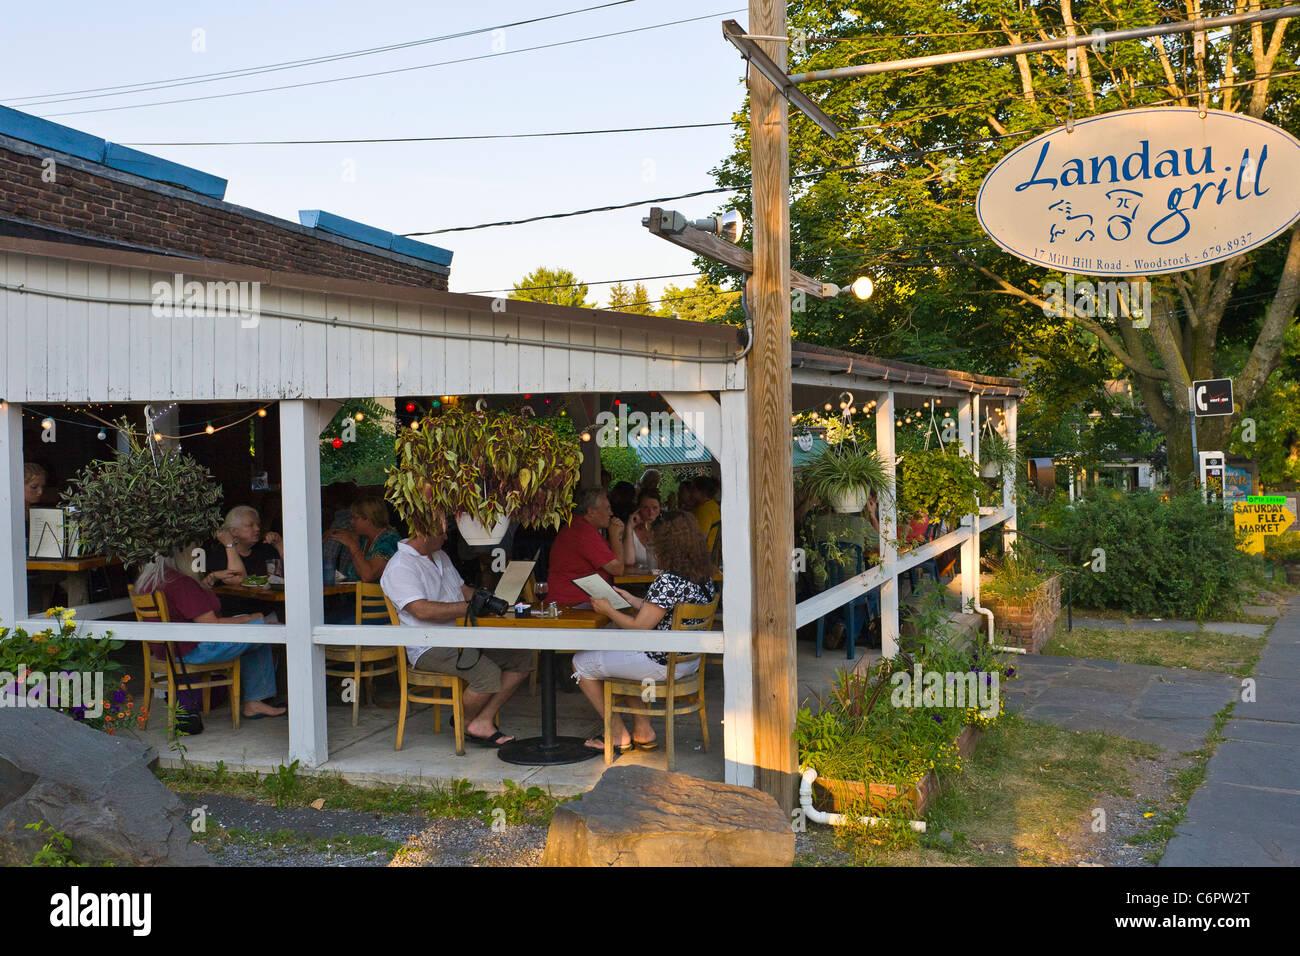 Landau Grill en Woodstock Nueva York Imagen De Stock